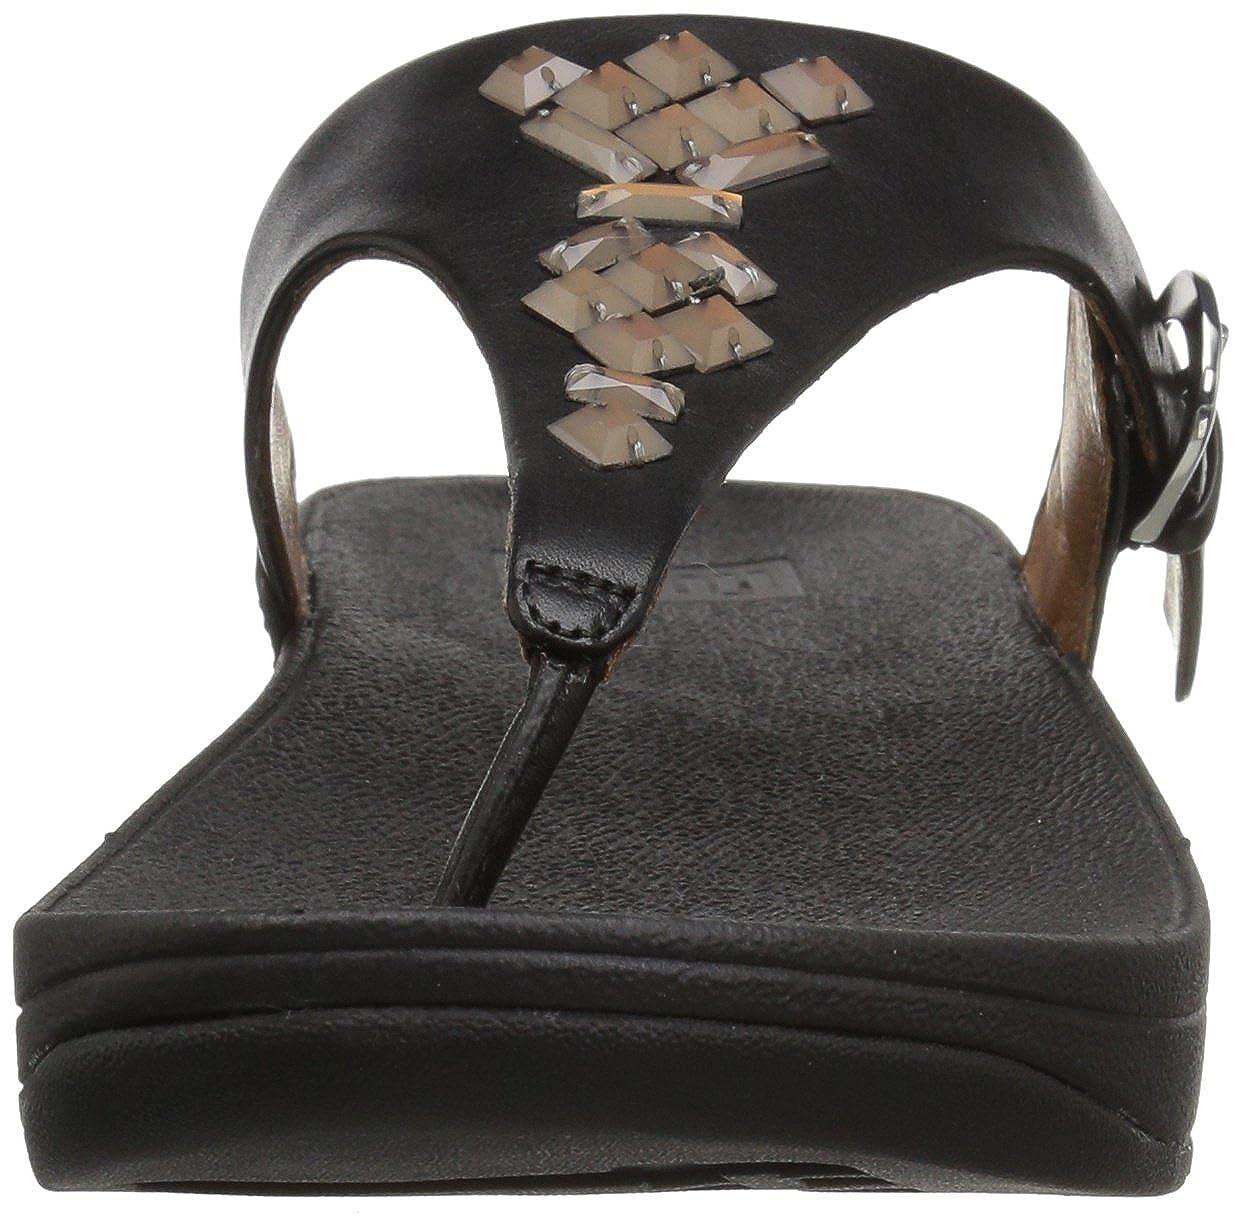 6ddaf5e30 Fitflop Women s s Skinny Tm Toe-Thong Sandals Crystal Flip Flops   Amazon.co.uk  Shoes   Bags